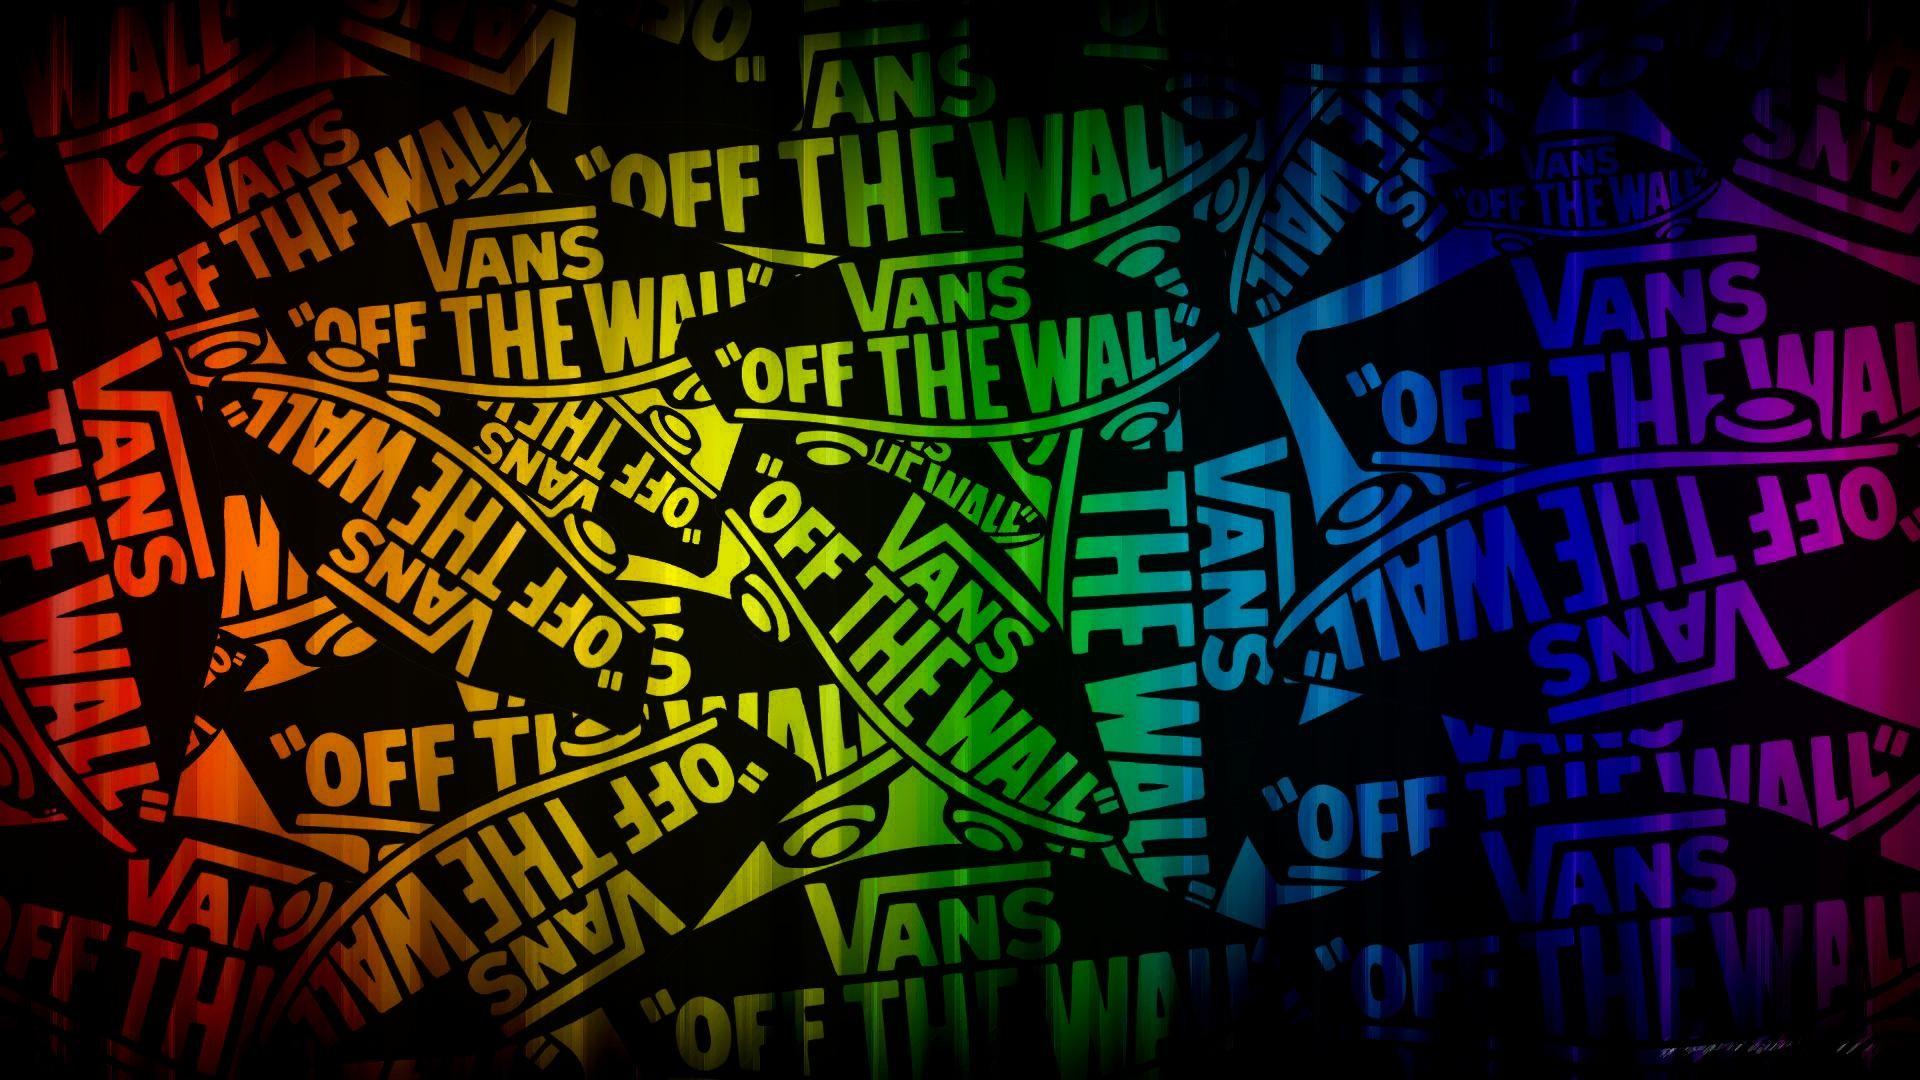 How To Get Wallpaper Off Walls .